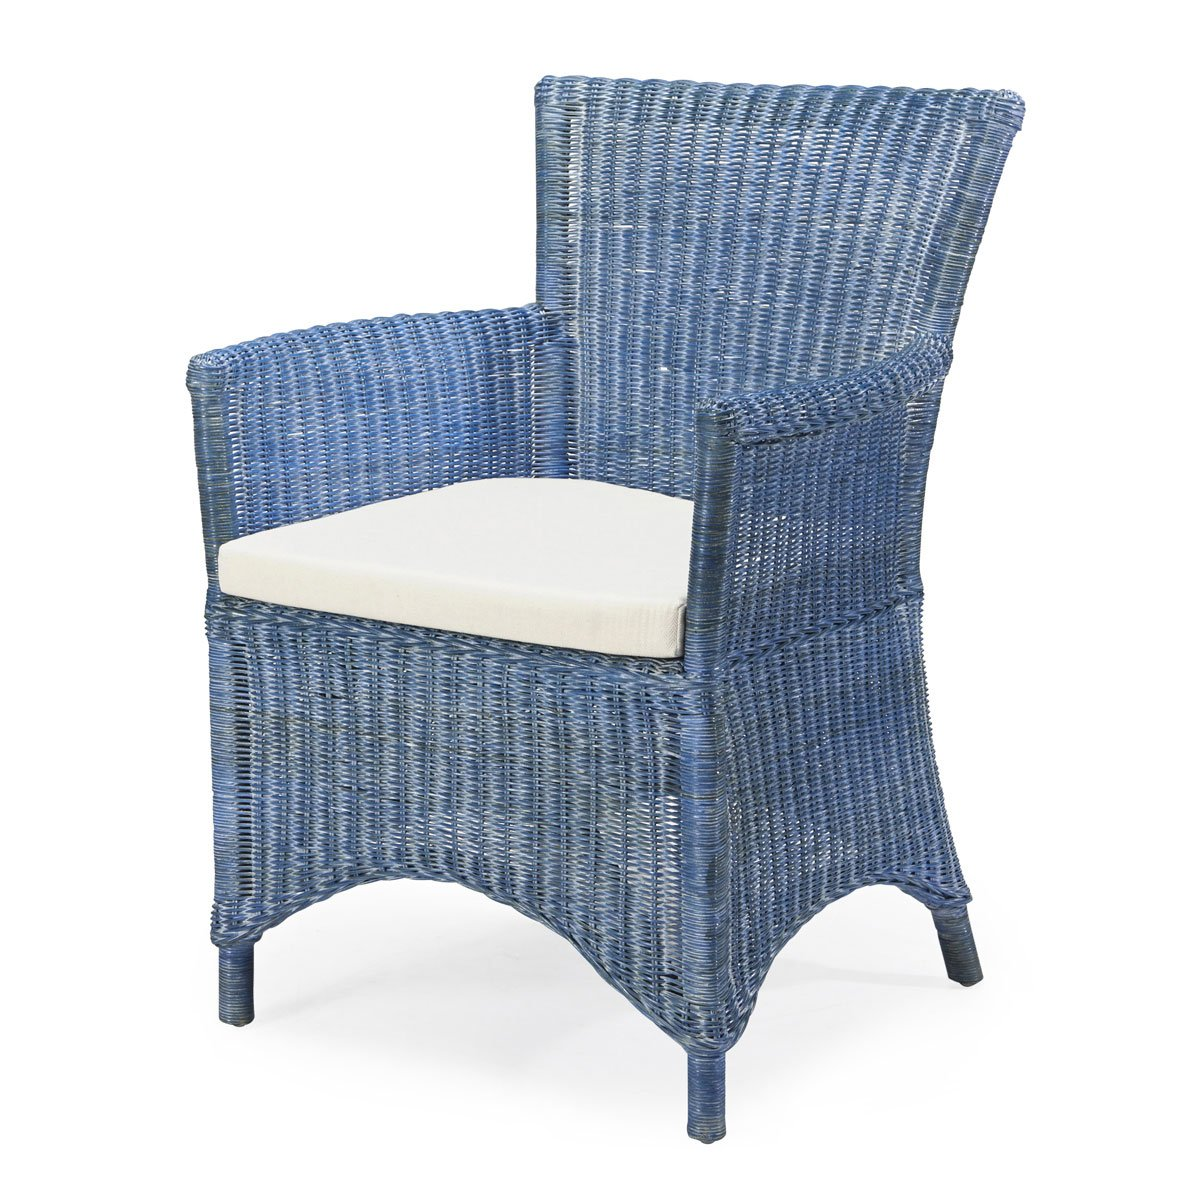 Rattan-Sessel ROSAS - Rattan - Vintage - inkl. Sitzkissen - Blau ...